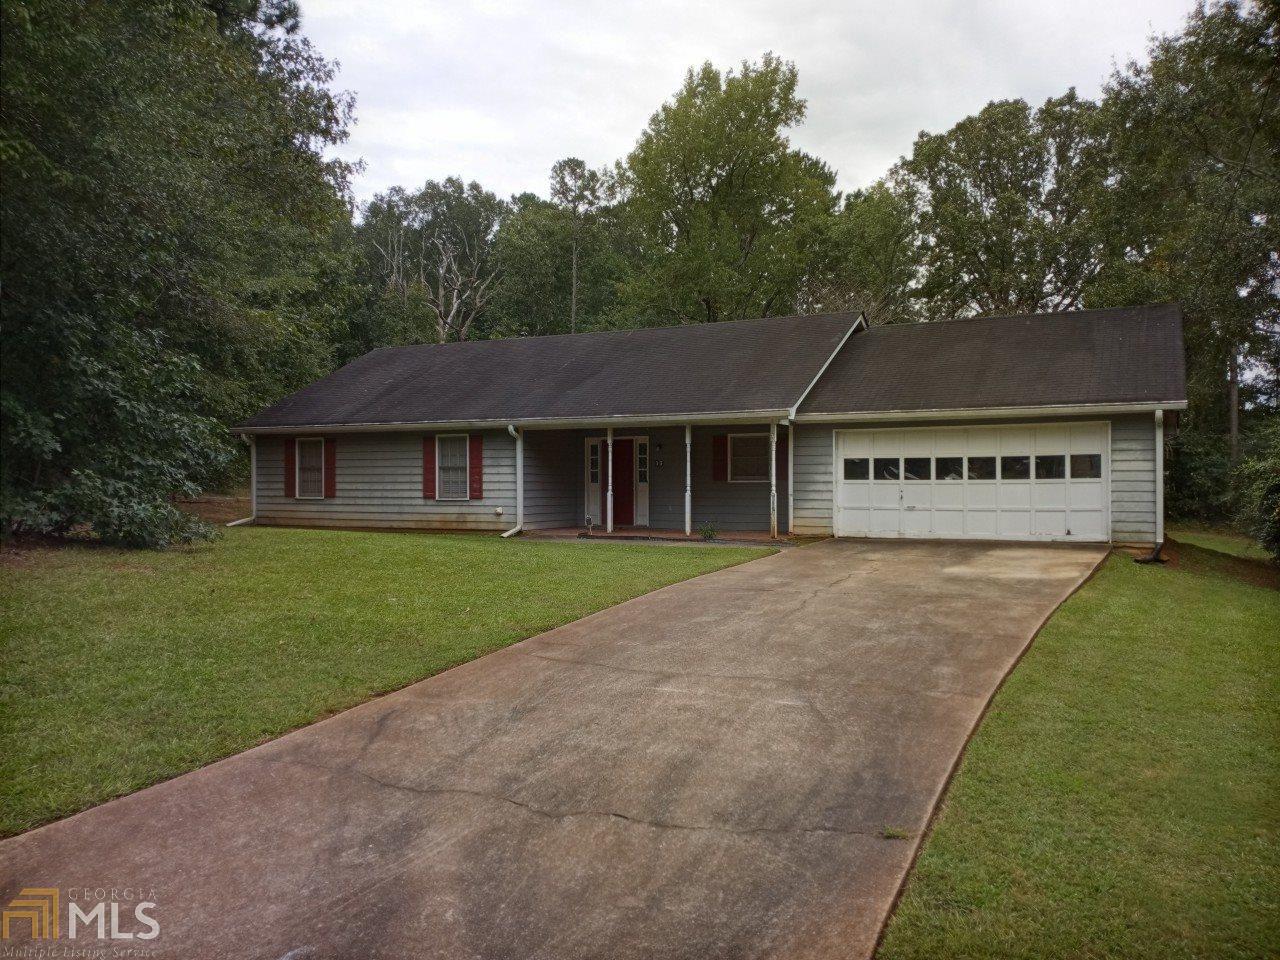 35 Christian Woods Ln, Conyers, GA 30013 - #: 8862634